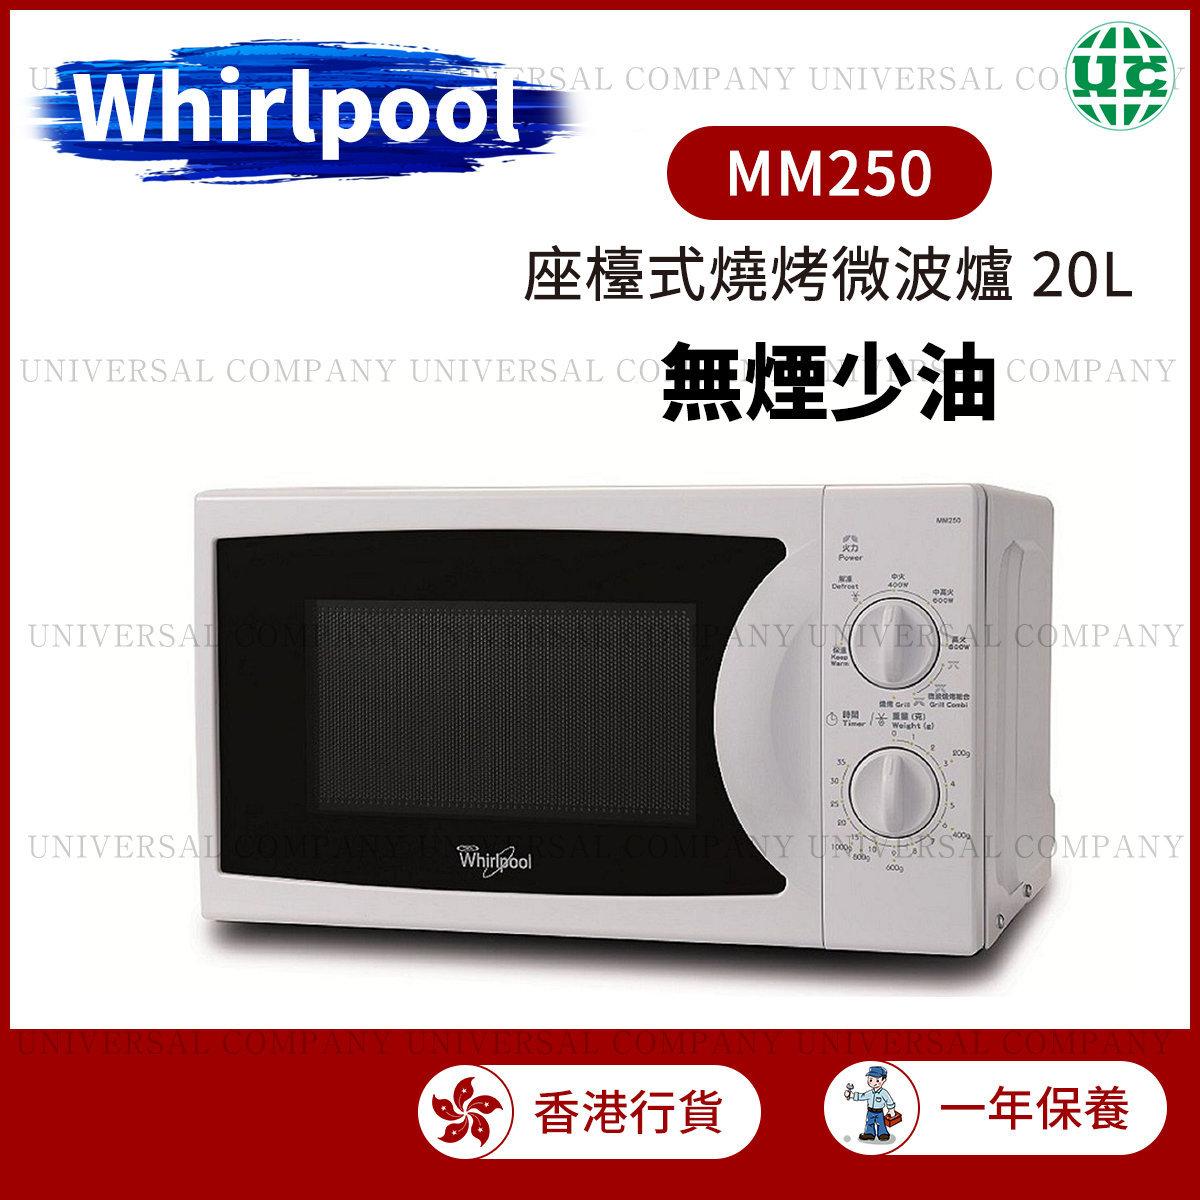 MM250 20L 無煙少油 座檯式燒烤微波爐(香港行貨)